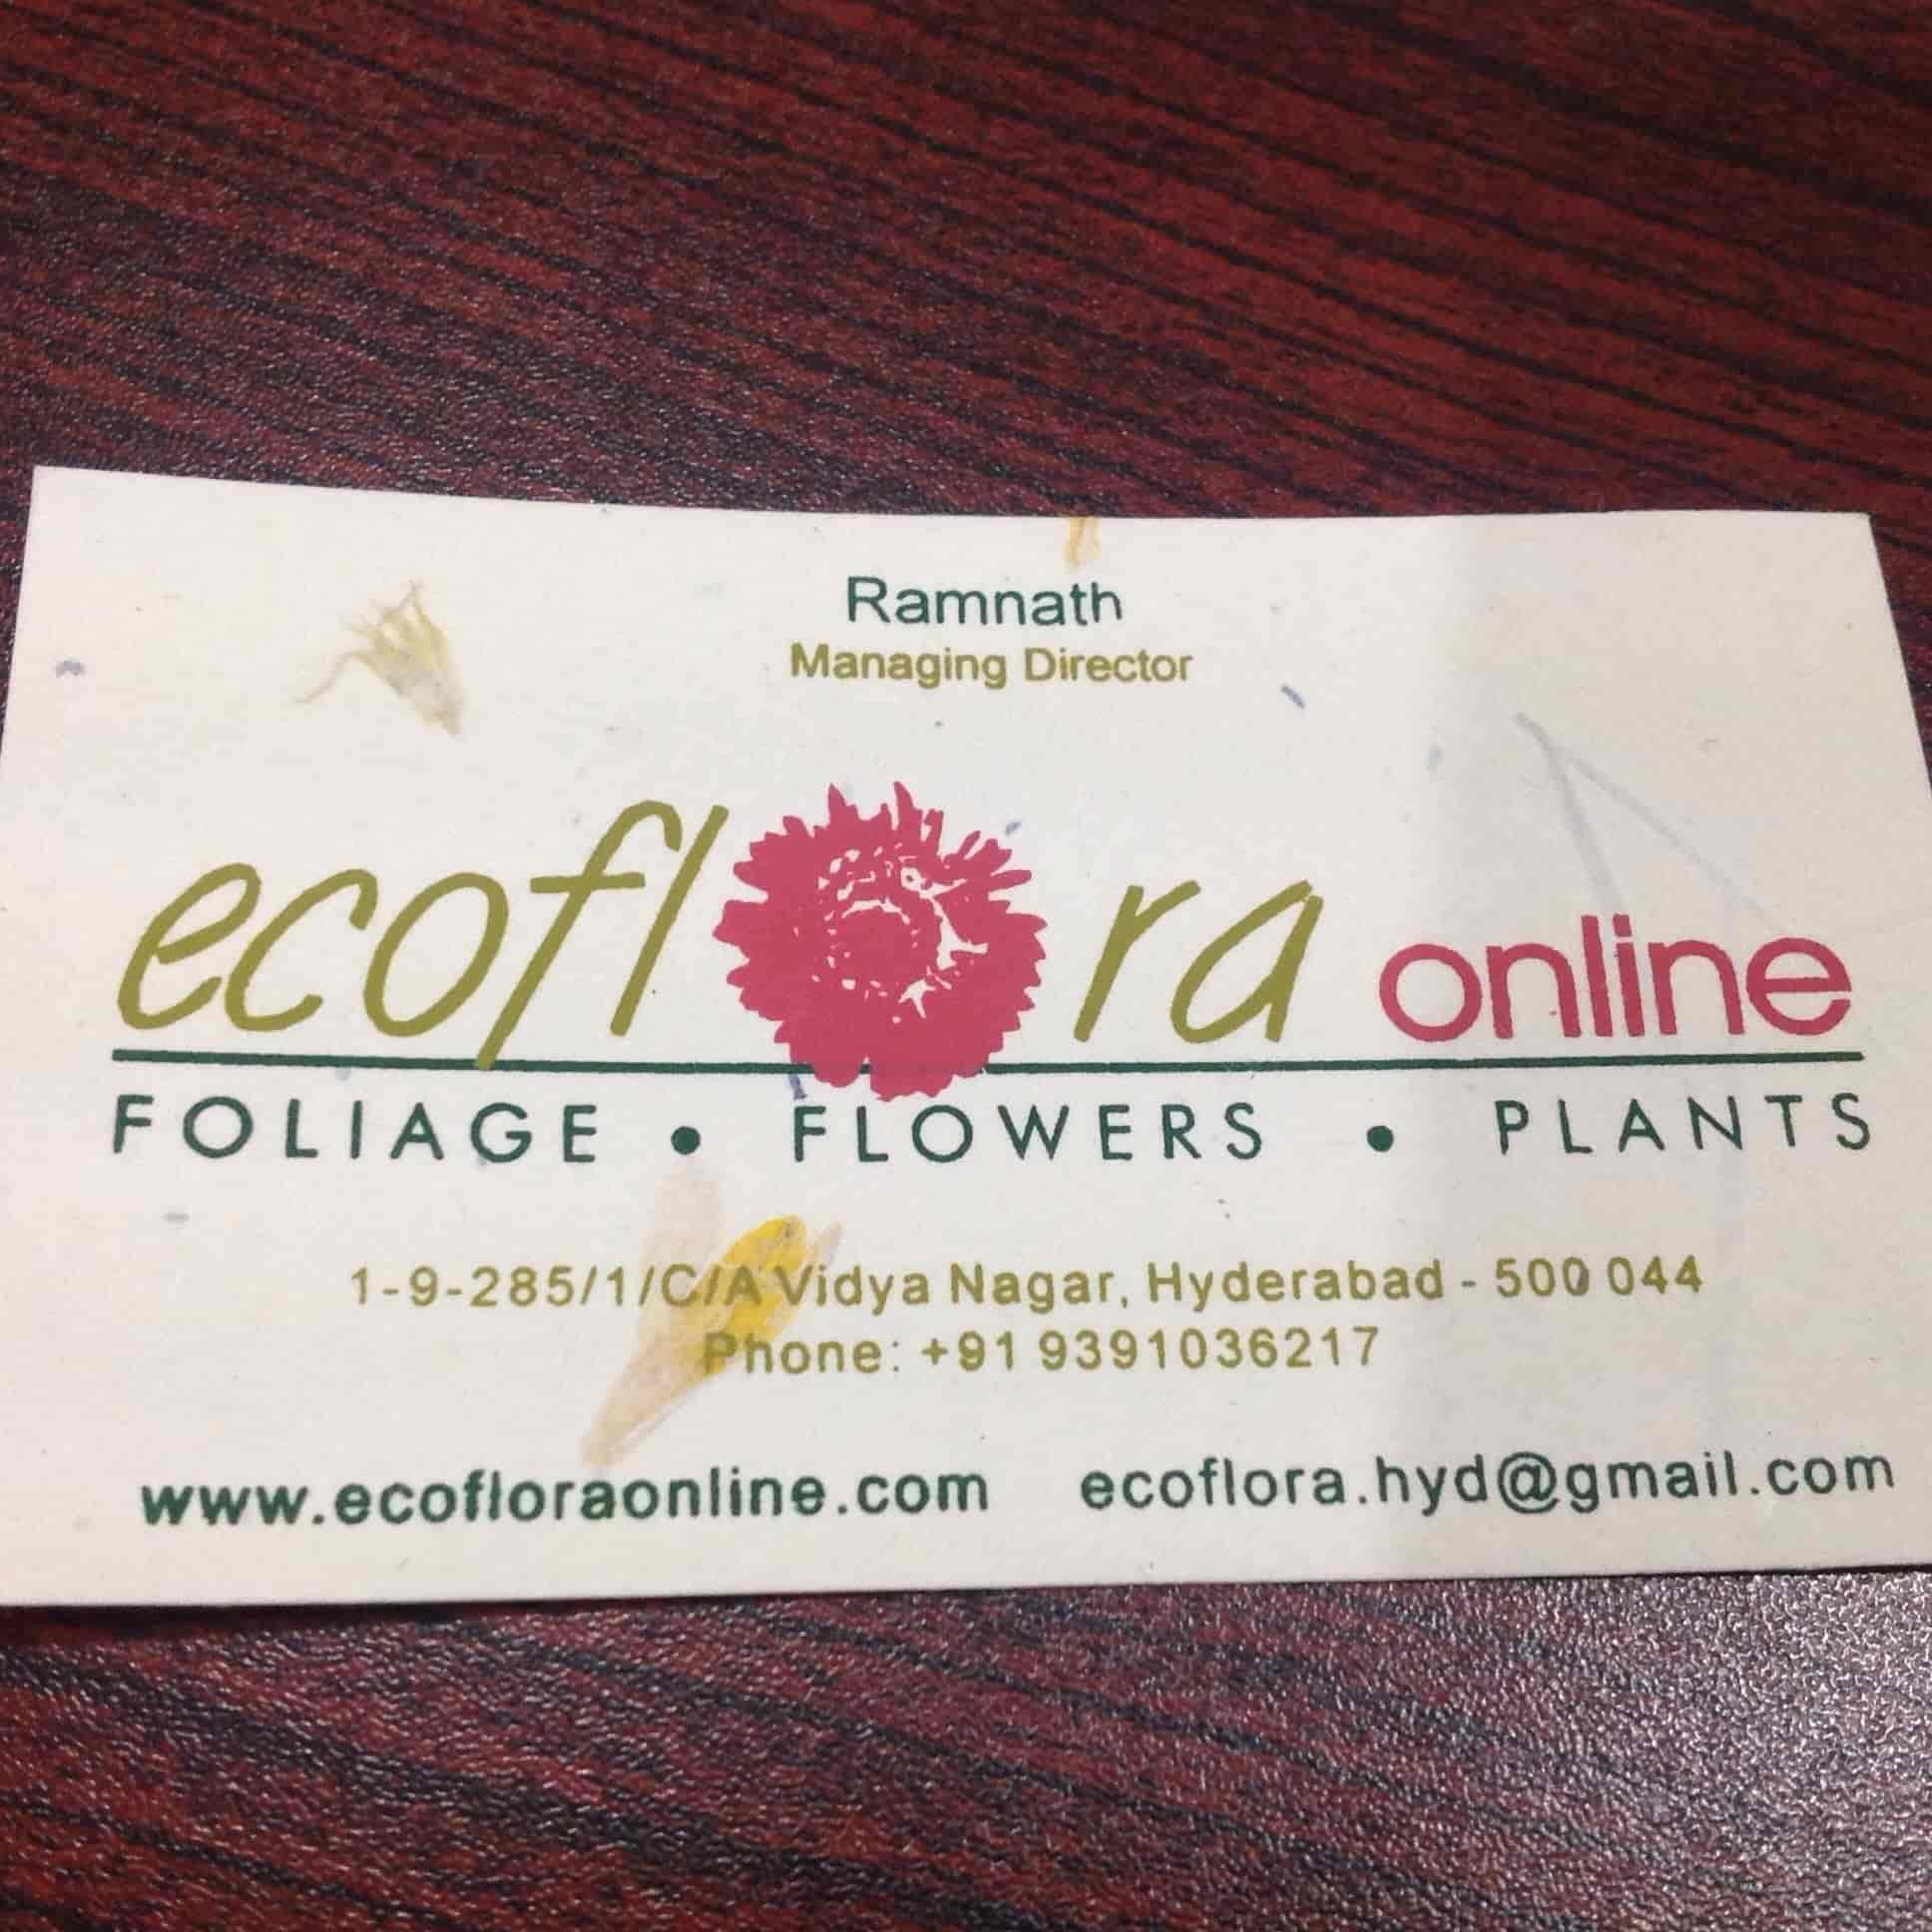 Ecoflora photos sitaphalmandi hyderabad pictures images gallery business card ecoflora photos sitaphalmandi hyderabad flower wholesalers reheart Image collections